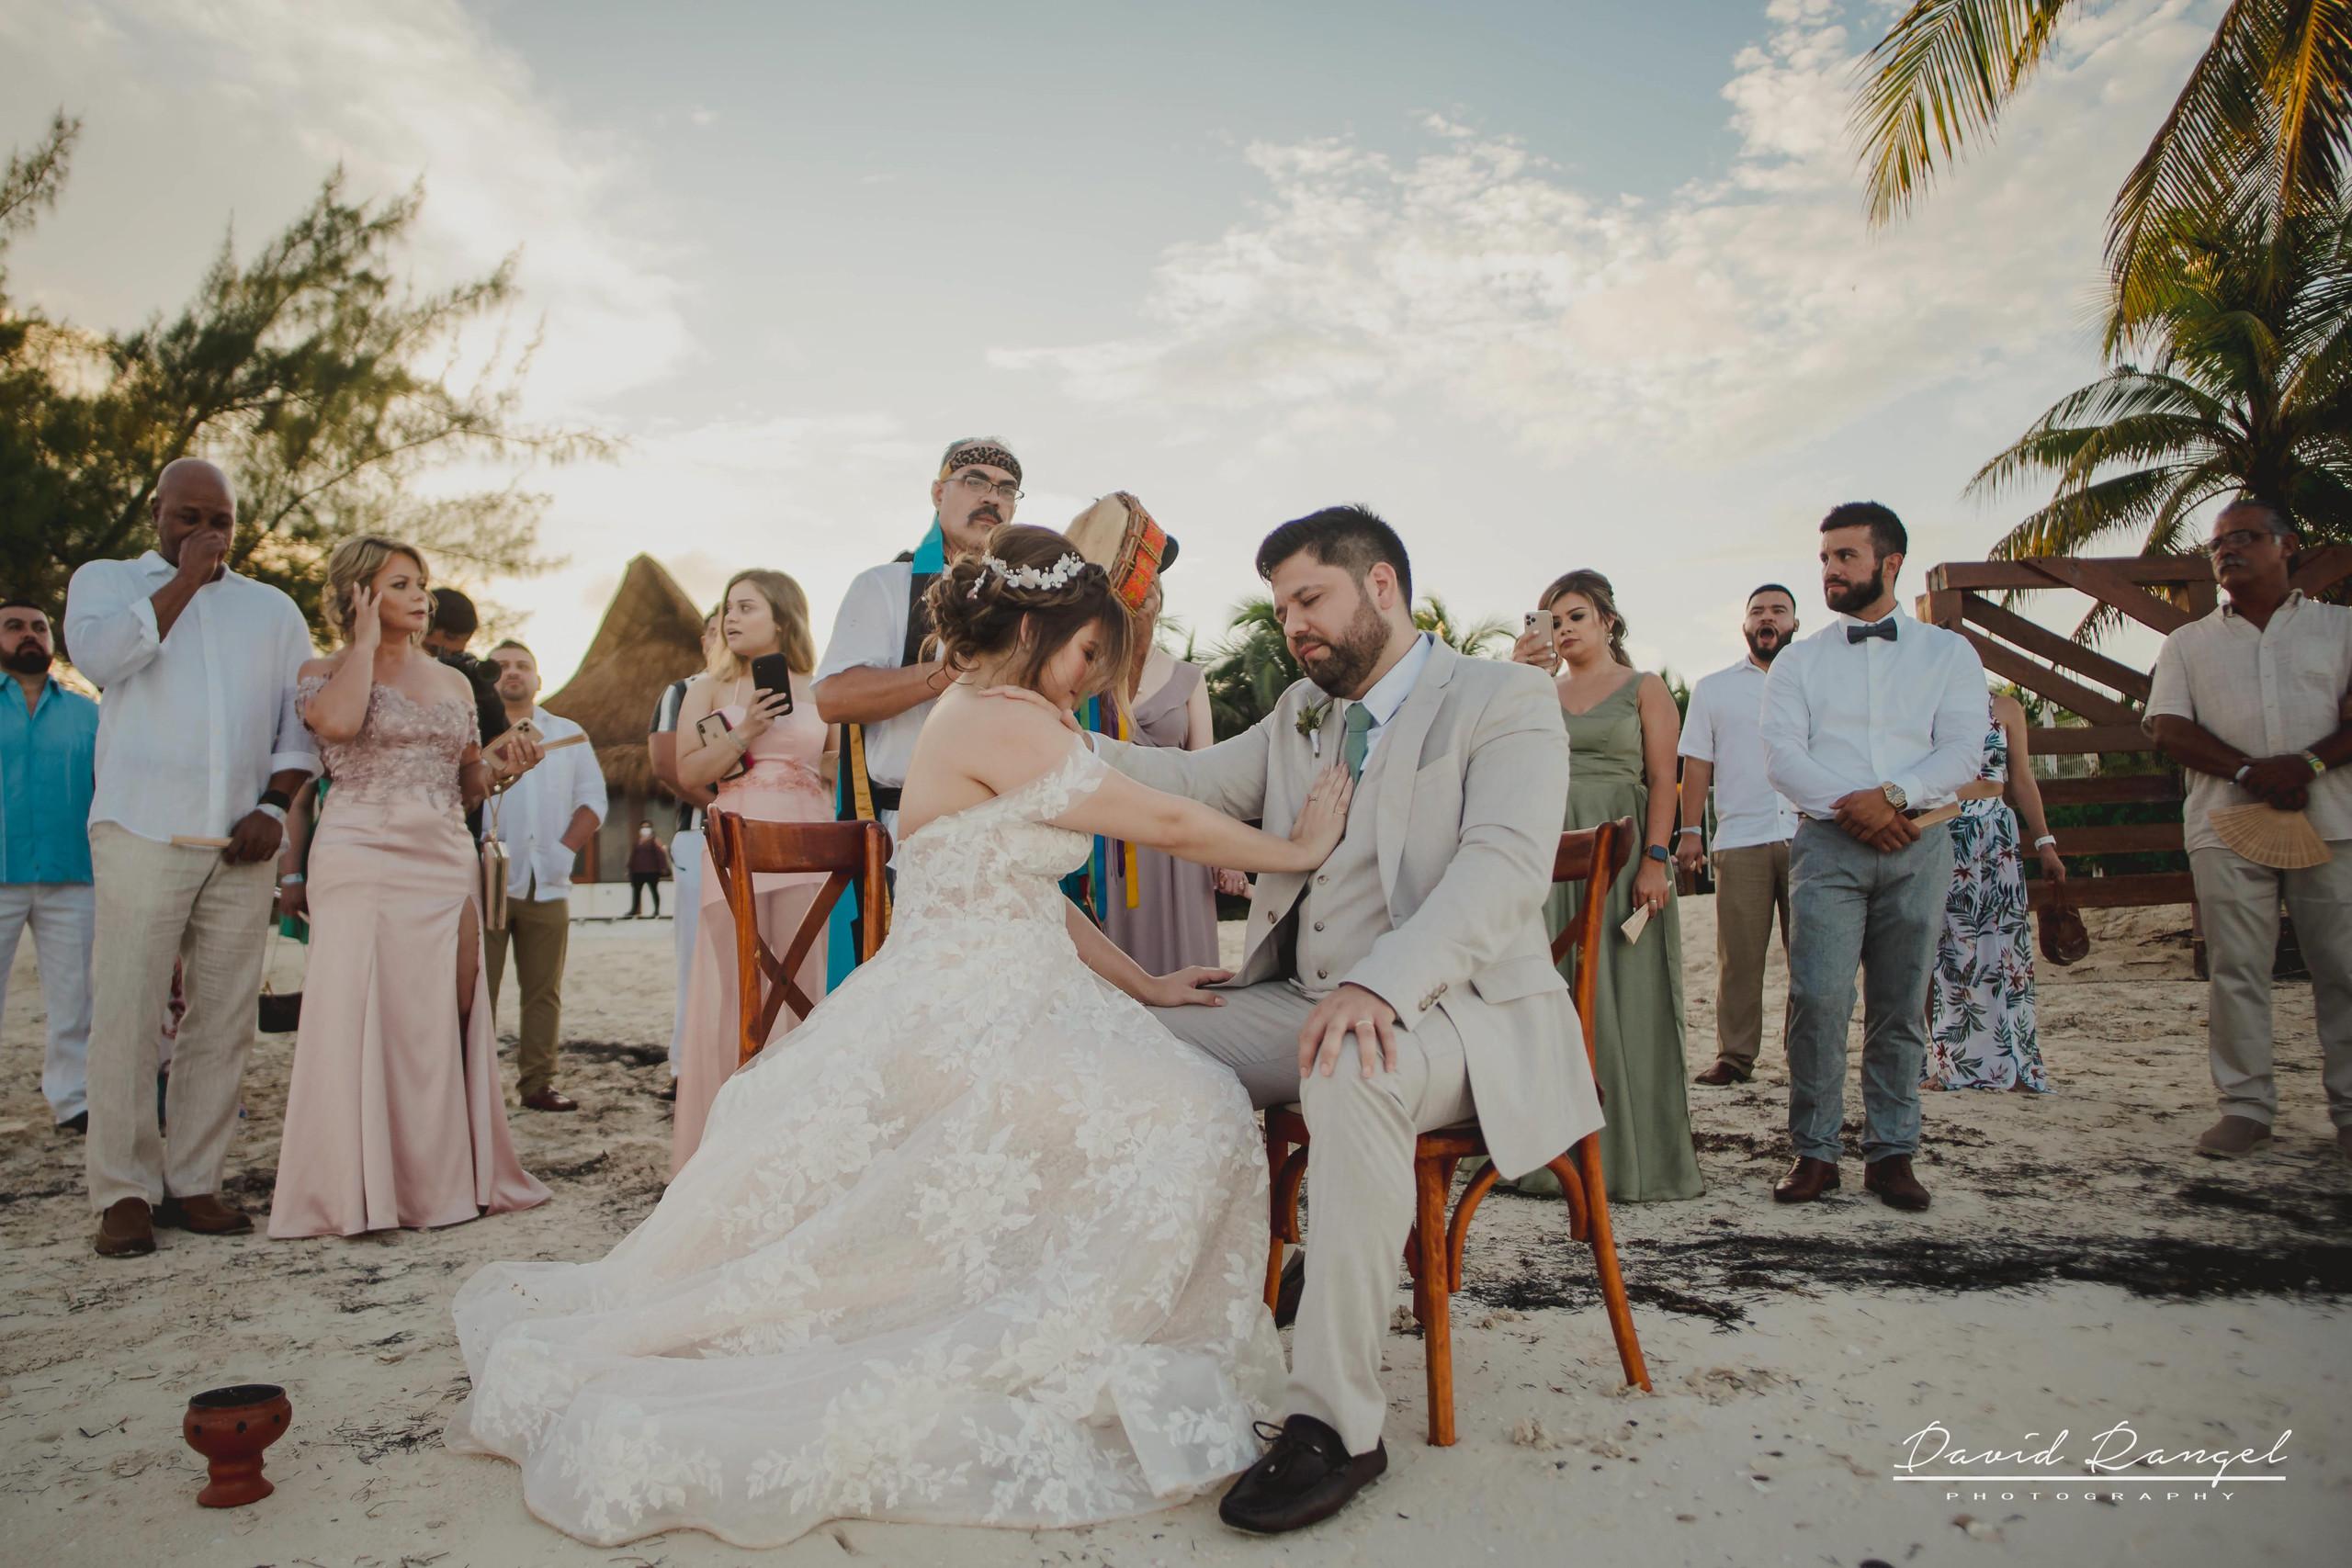 groom+bride+wedding+ceremony+dress+villa+chenera+isla+blanca+costa+mujeres+garden+beach+chaman+traditional+mayan+wedding+friends+family